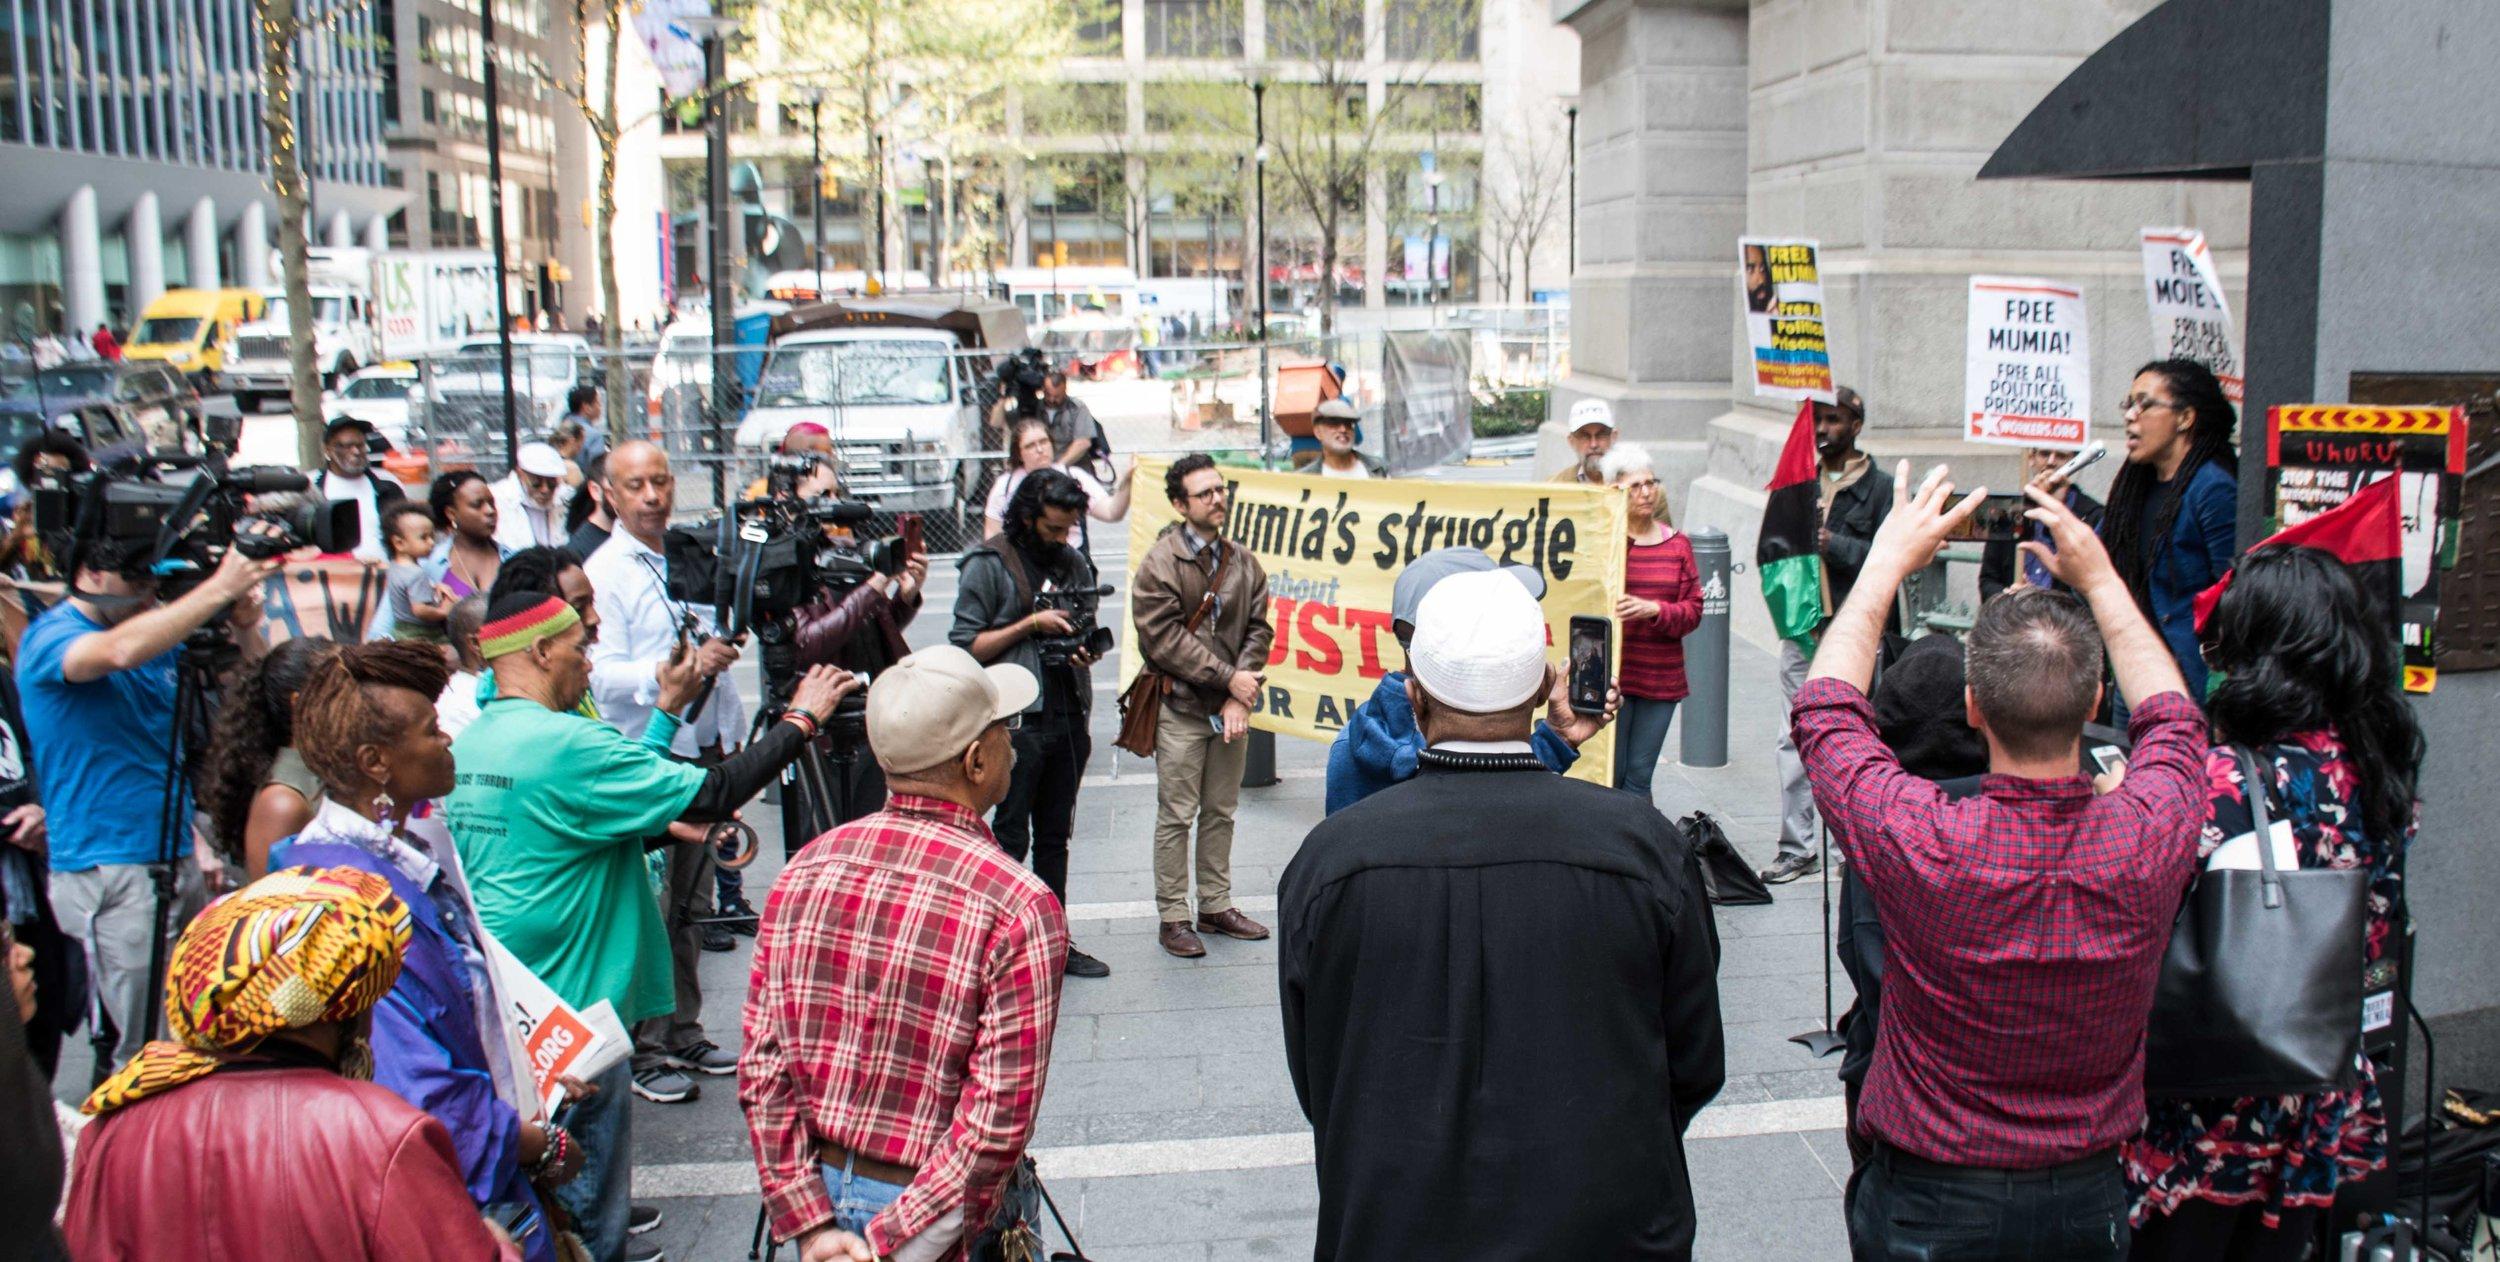 Philadelphia, Apr 18, 2019 - Press Conference for Mumia Abu-Jamal. (photo credit: Joe Piette)